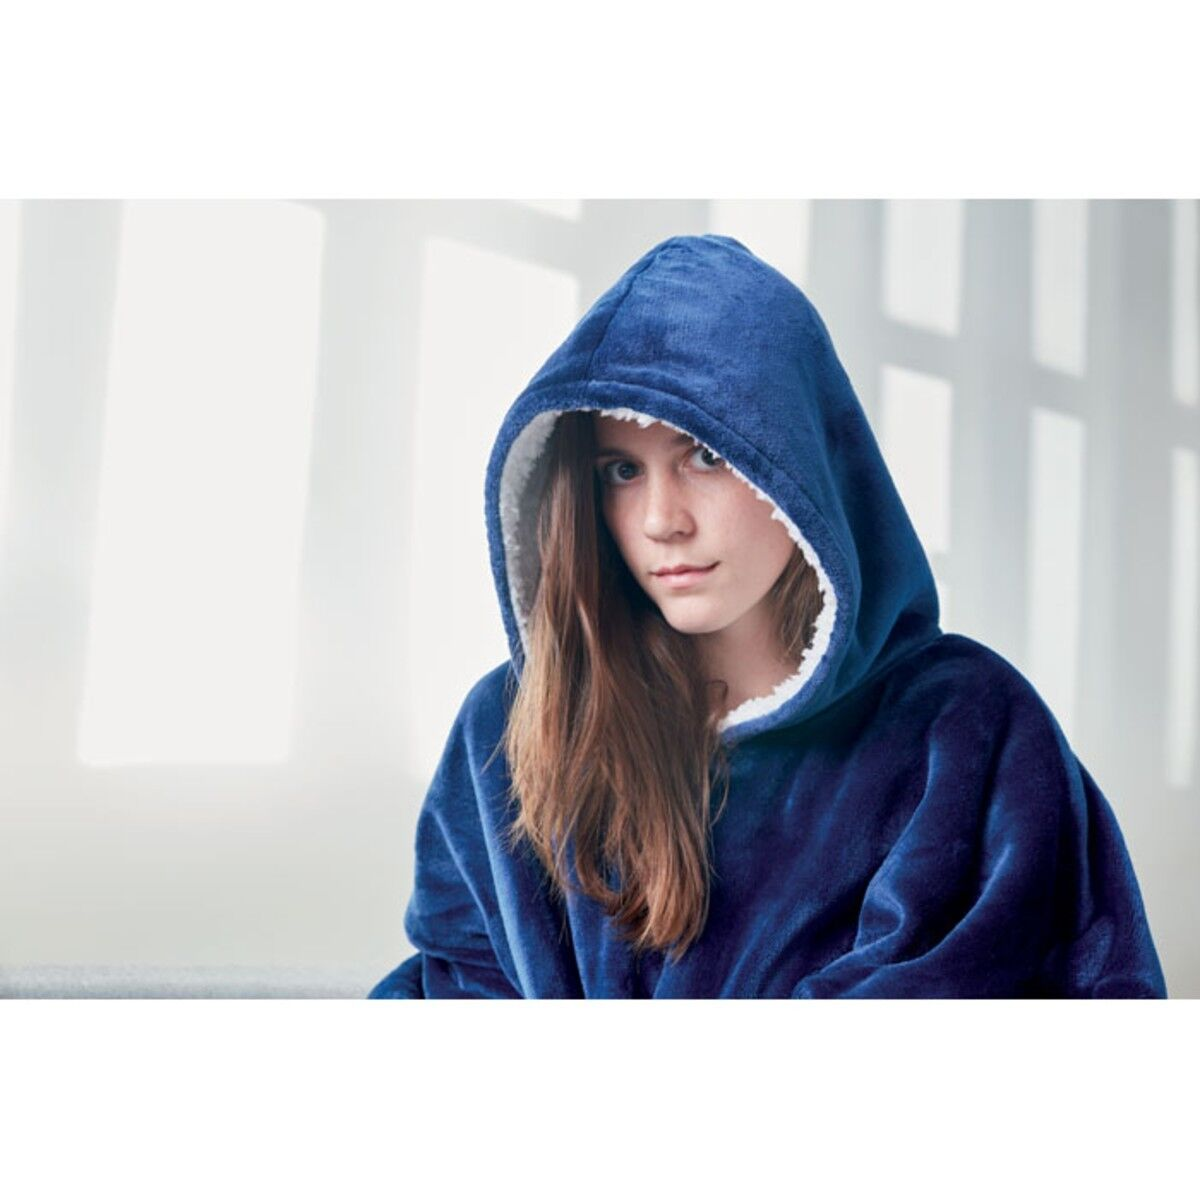 Blanket Sweatshirt in Blue colour